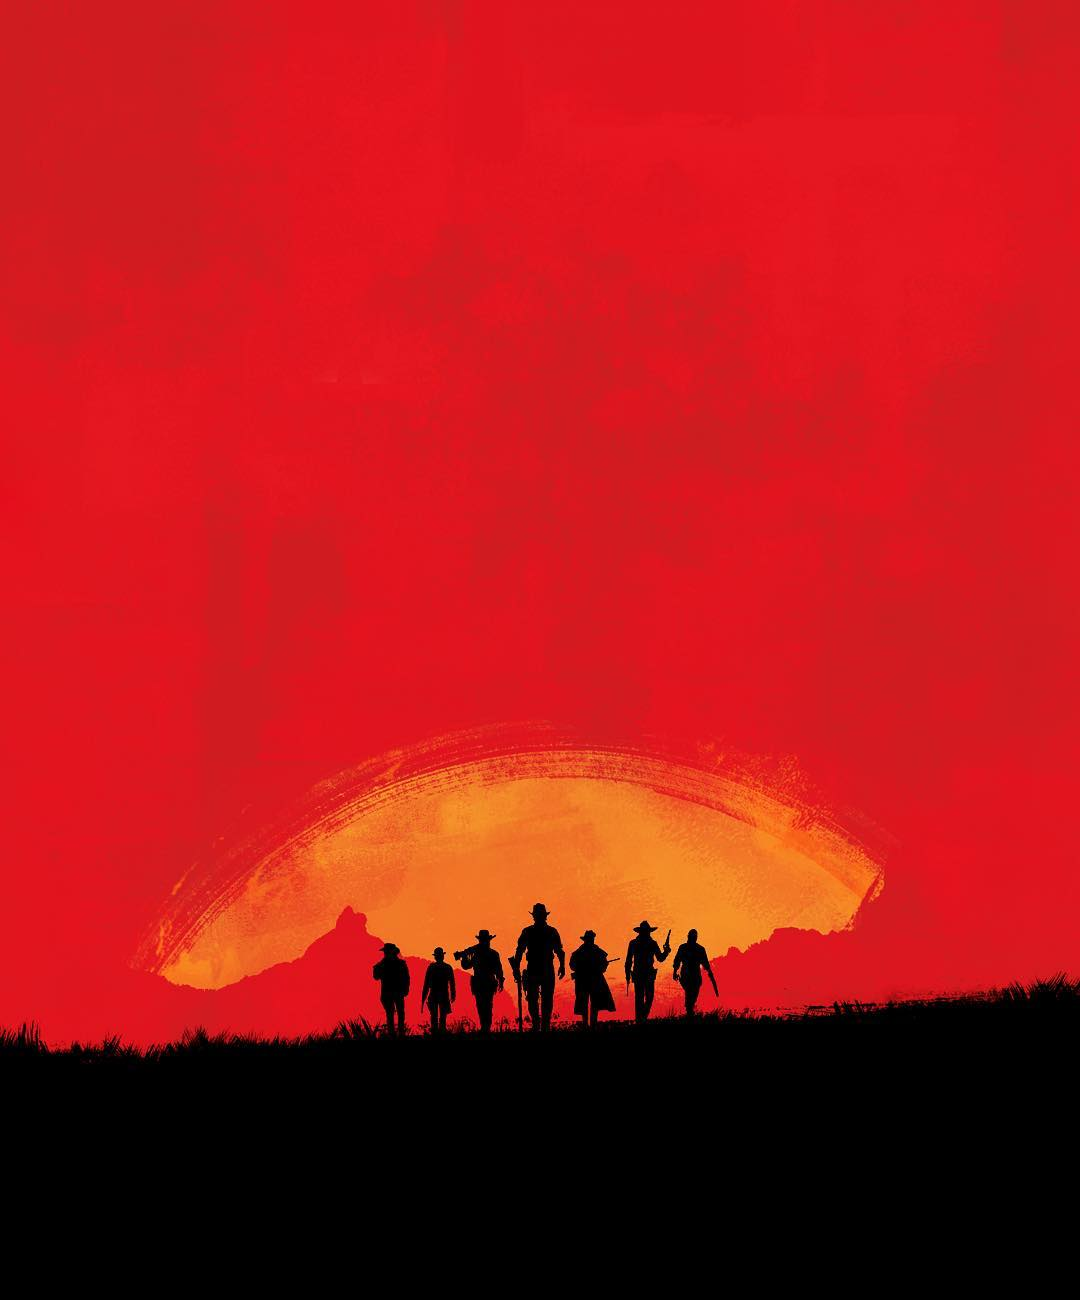 Red Dead...? - Изображение 1